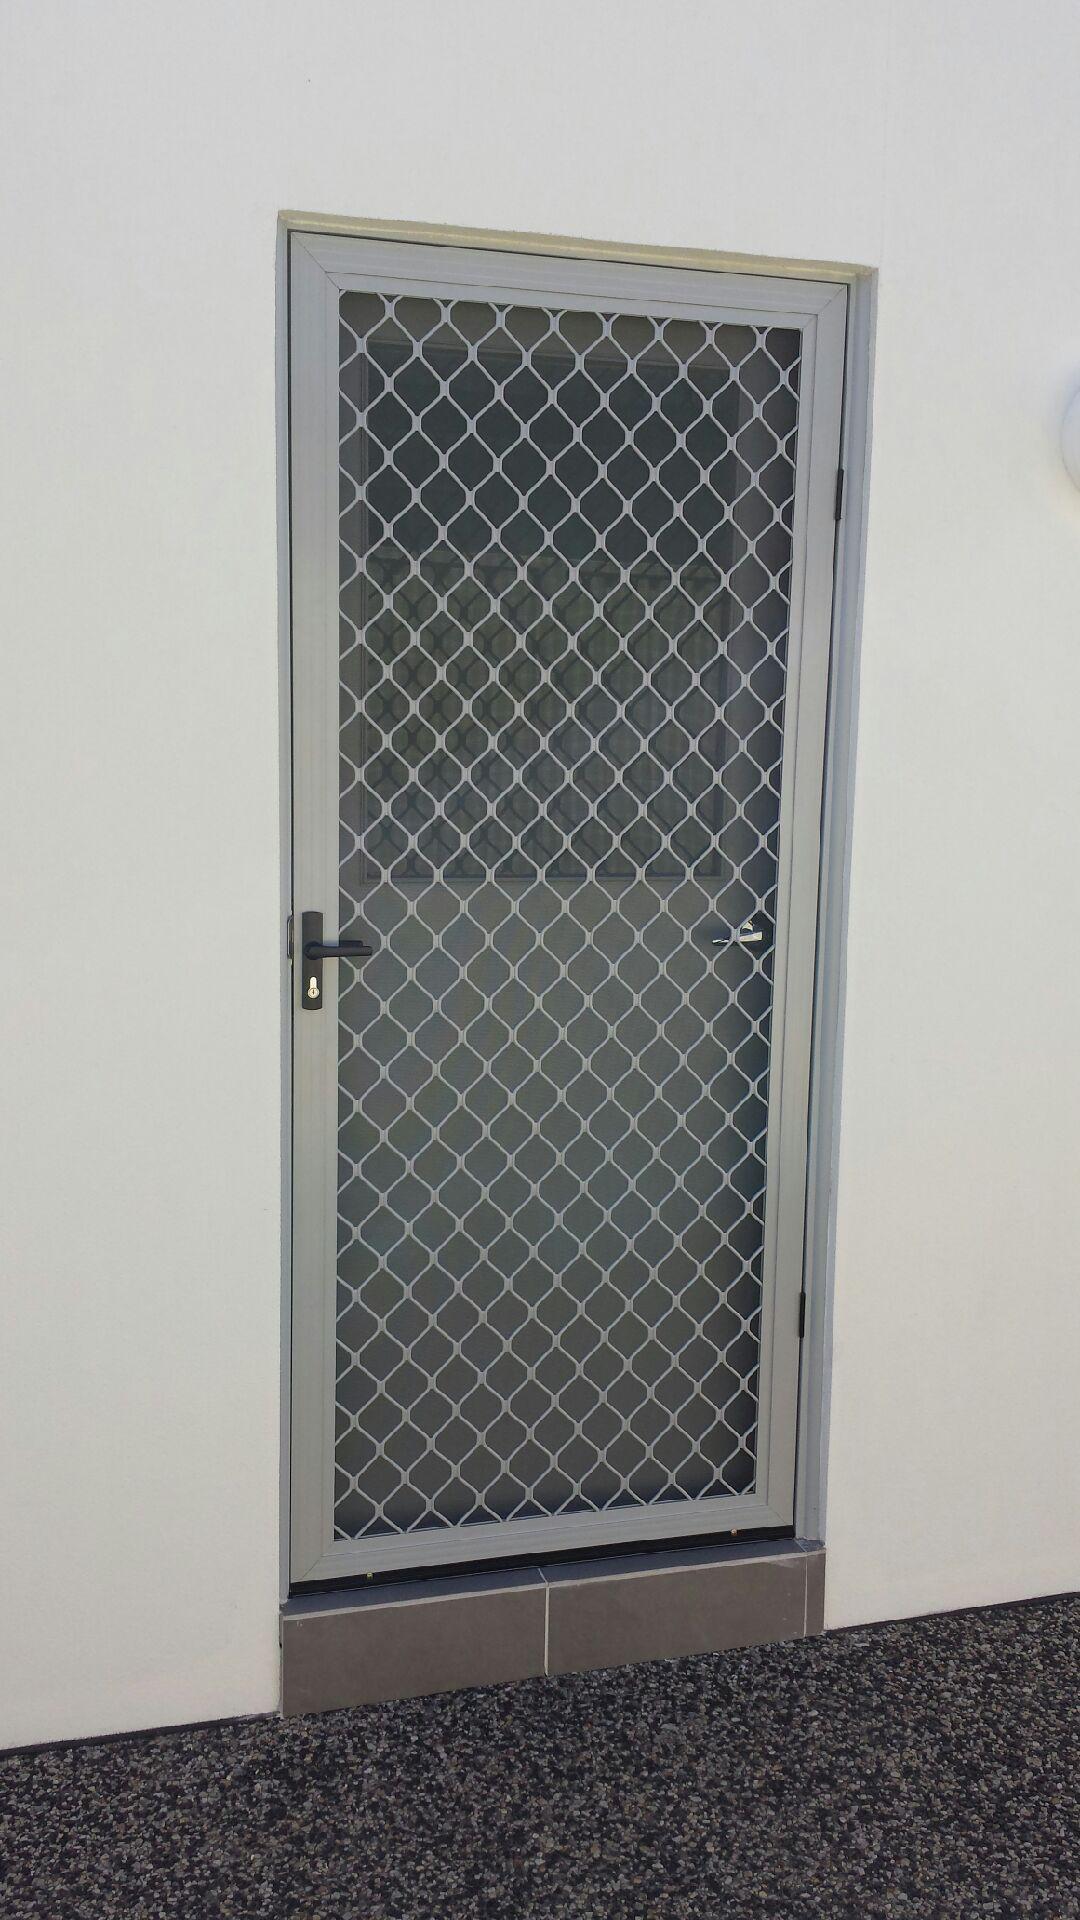 Aluminium Security Doors Amp Screens Hunter Valley Security